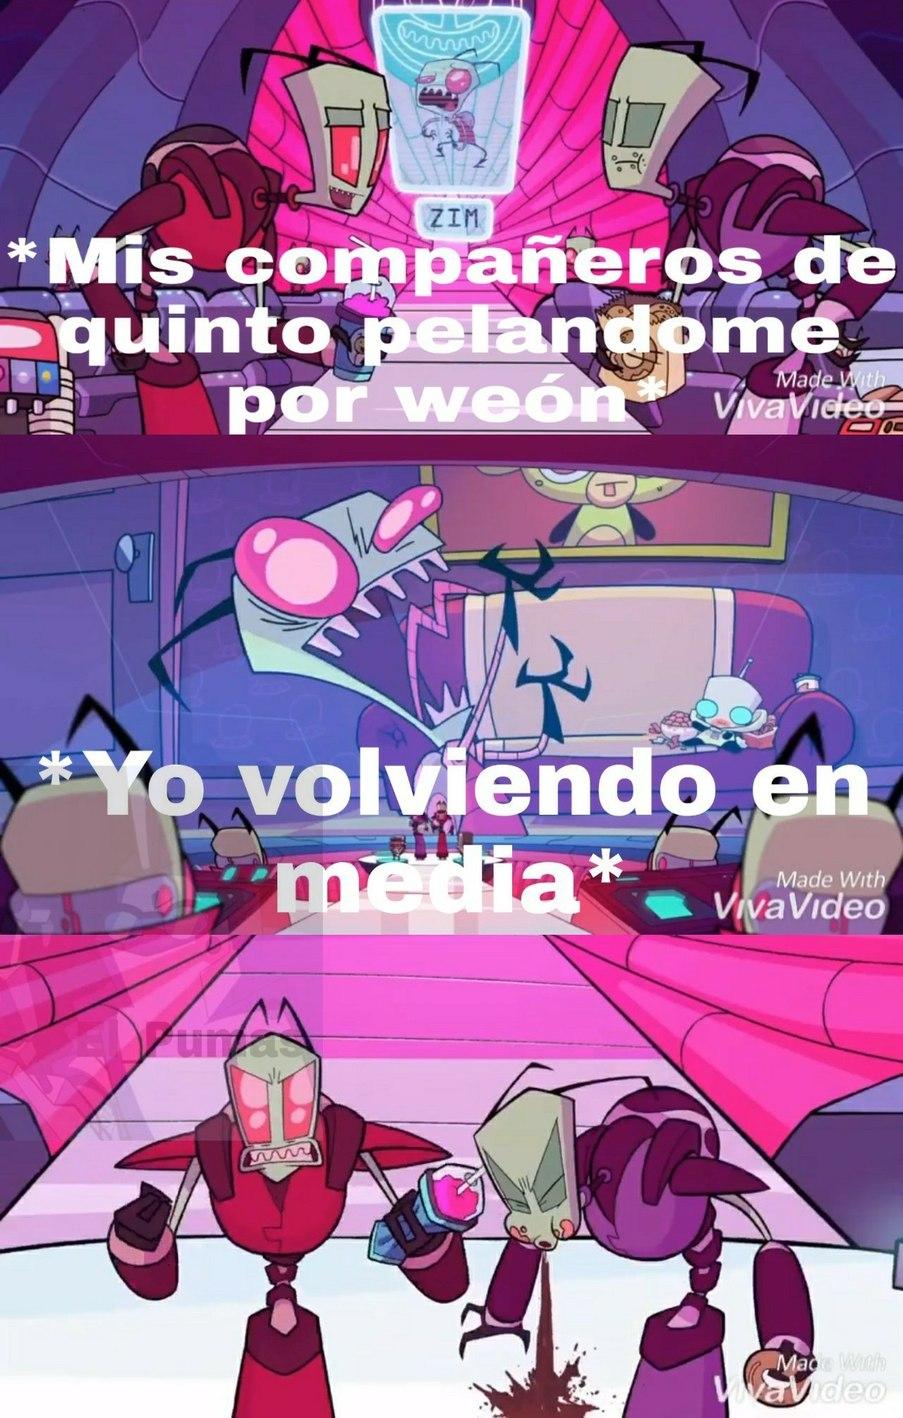 Poyoconsal - meme